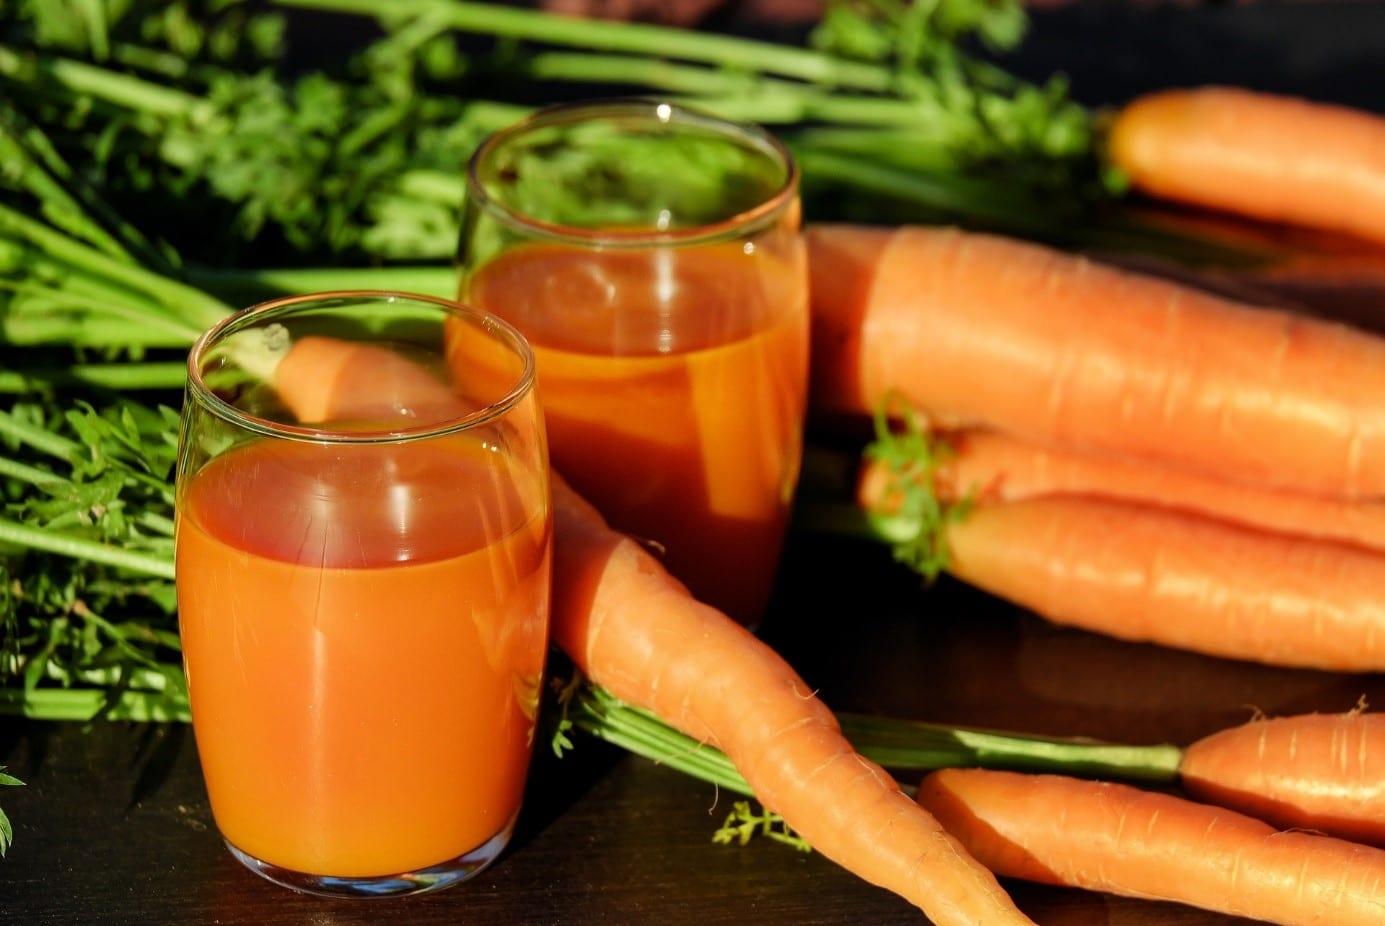 Béta karotin szem vitamin répa